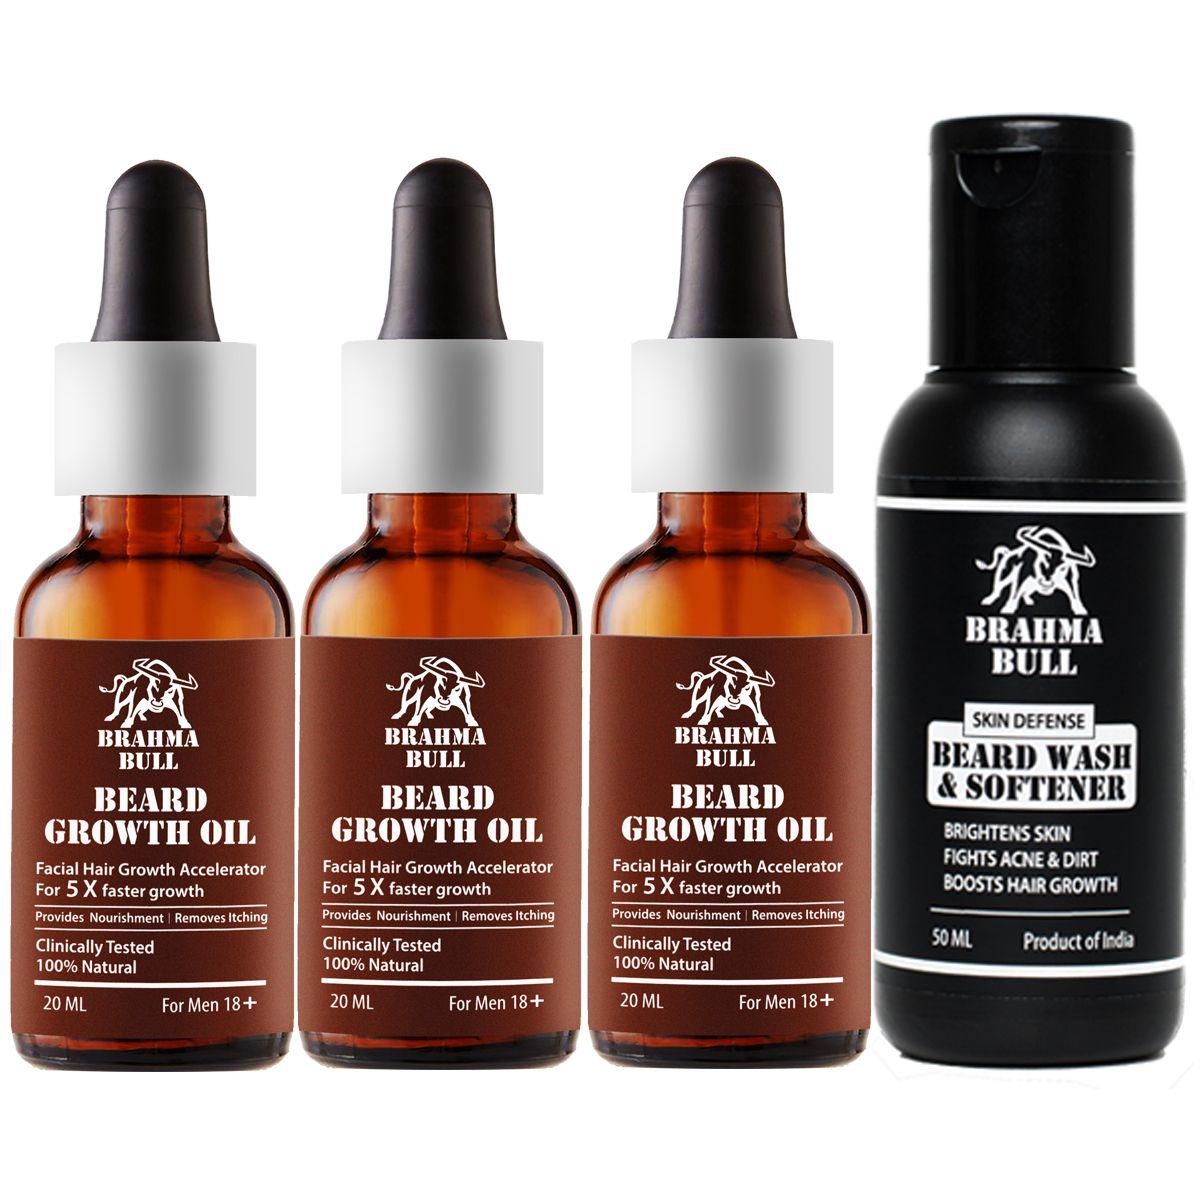 Brahma Bull Growth Kit Beard Oil 110 ml: Buy Brahma Bull ...